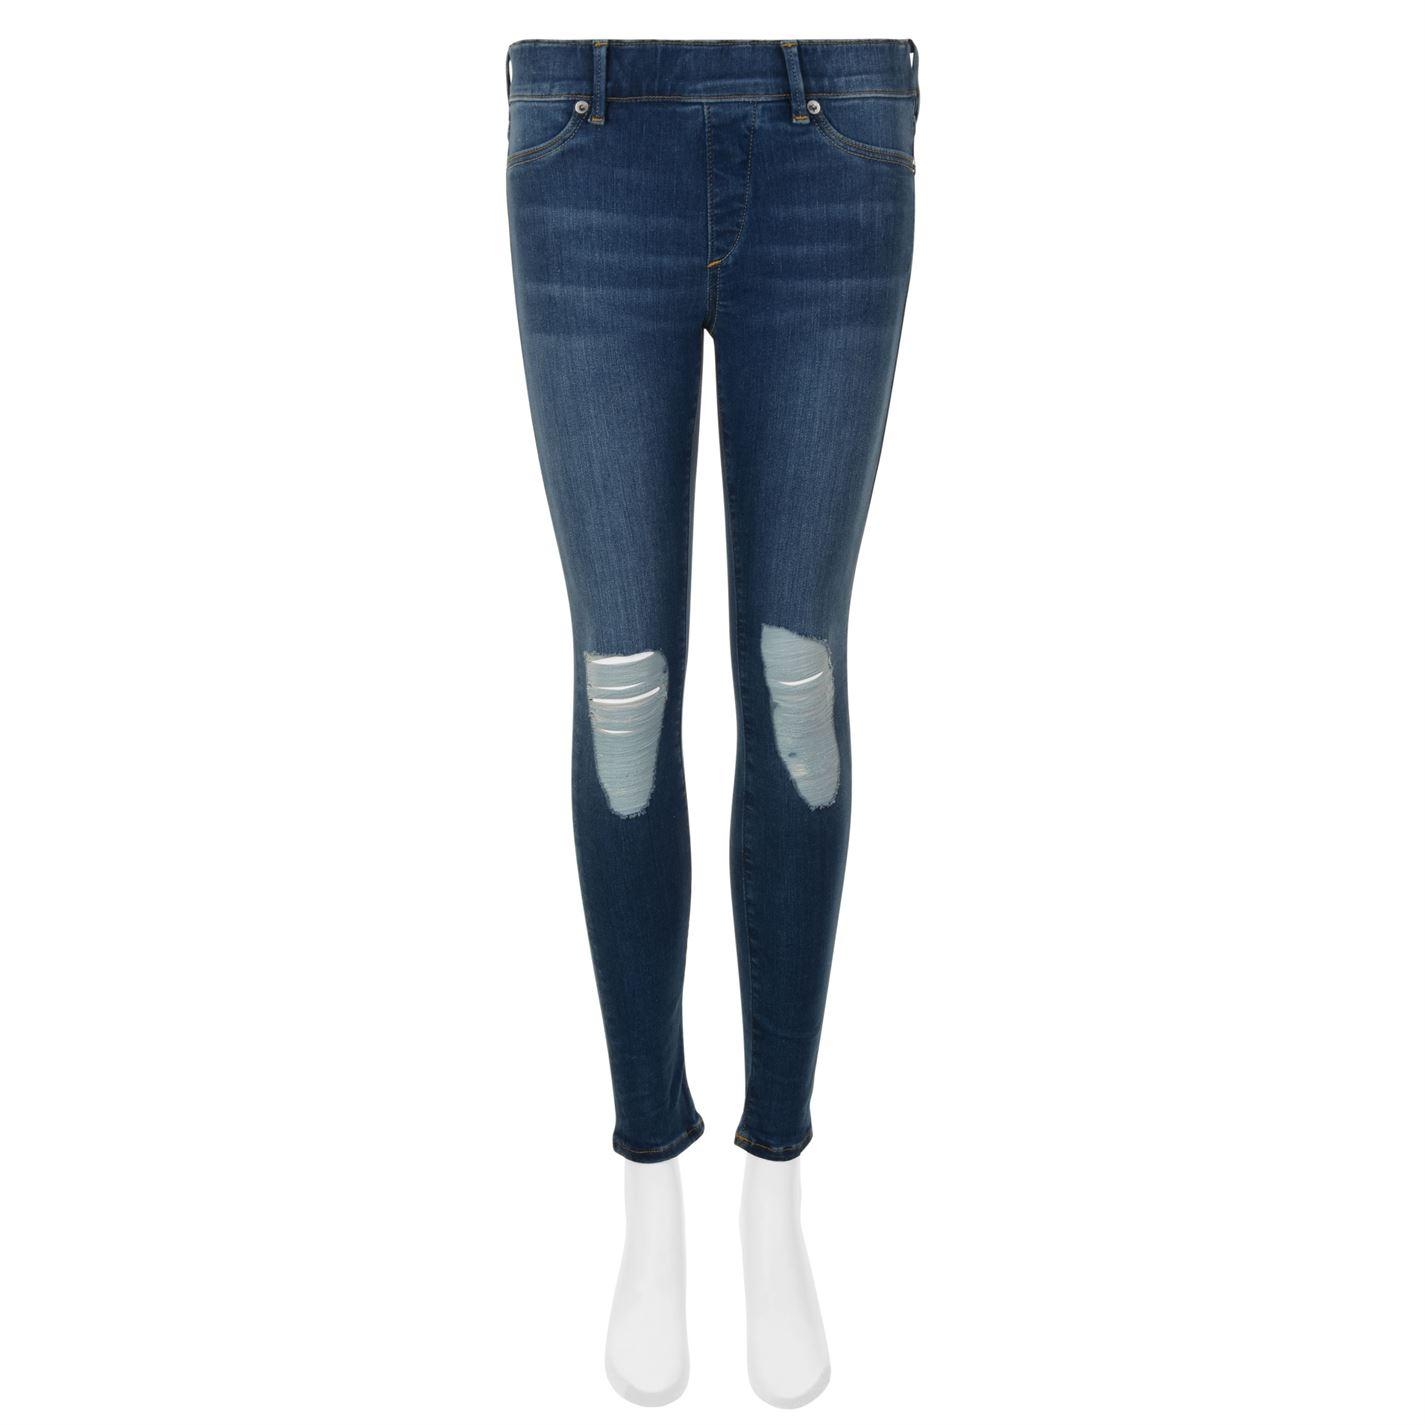 6ec39d943e6a2 Womens TRUE RELIGION Runaway Legging Jeans Jeggings Skinny Fit New ...